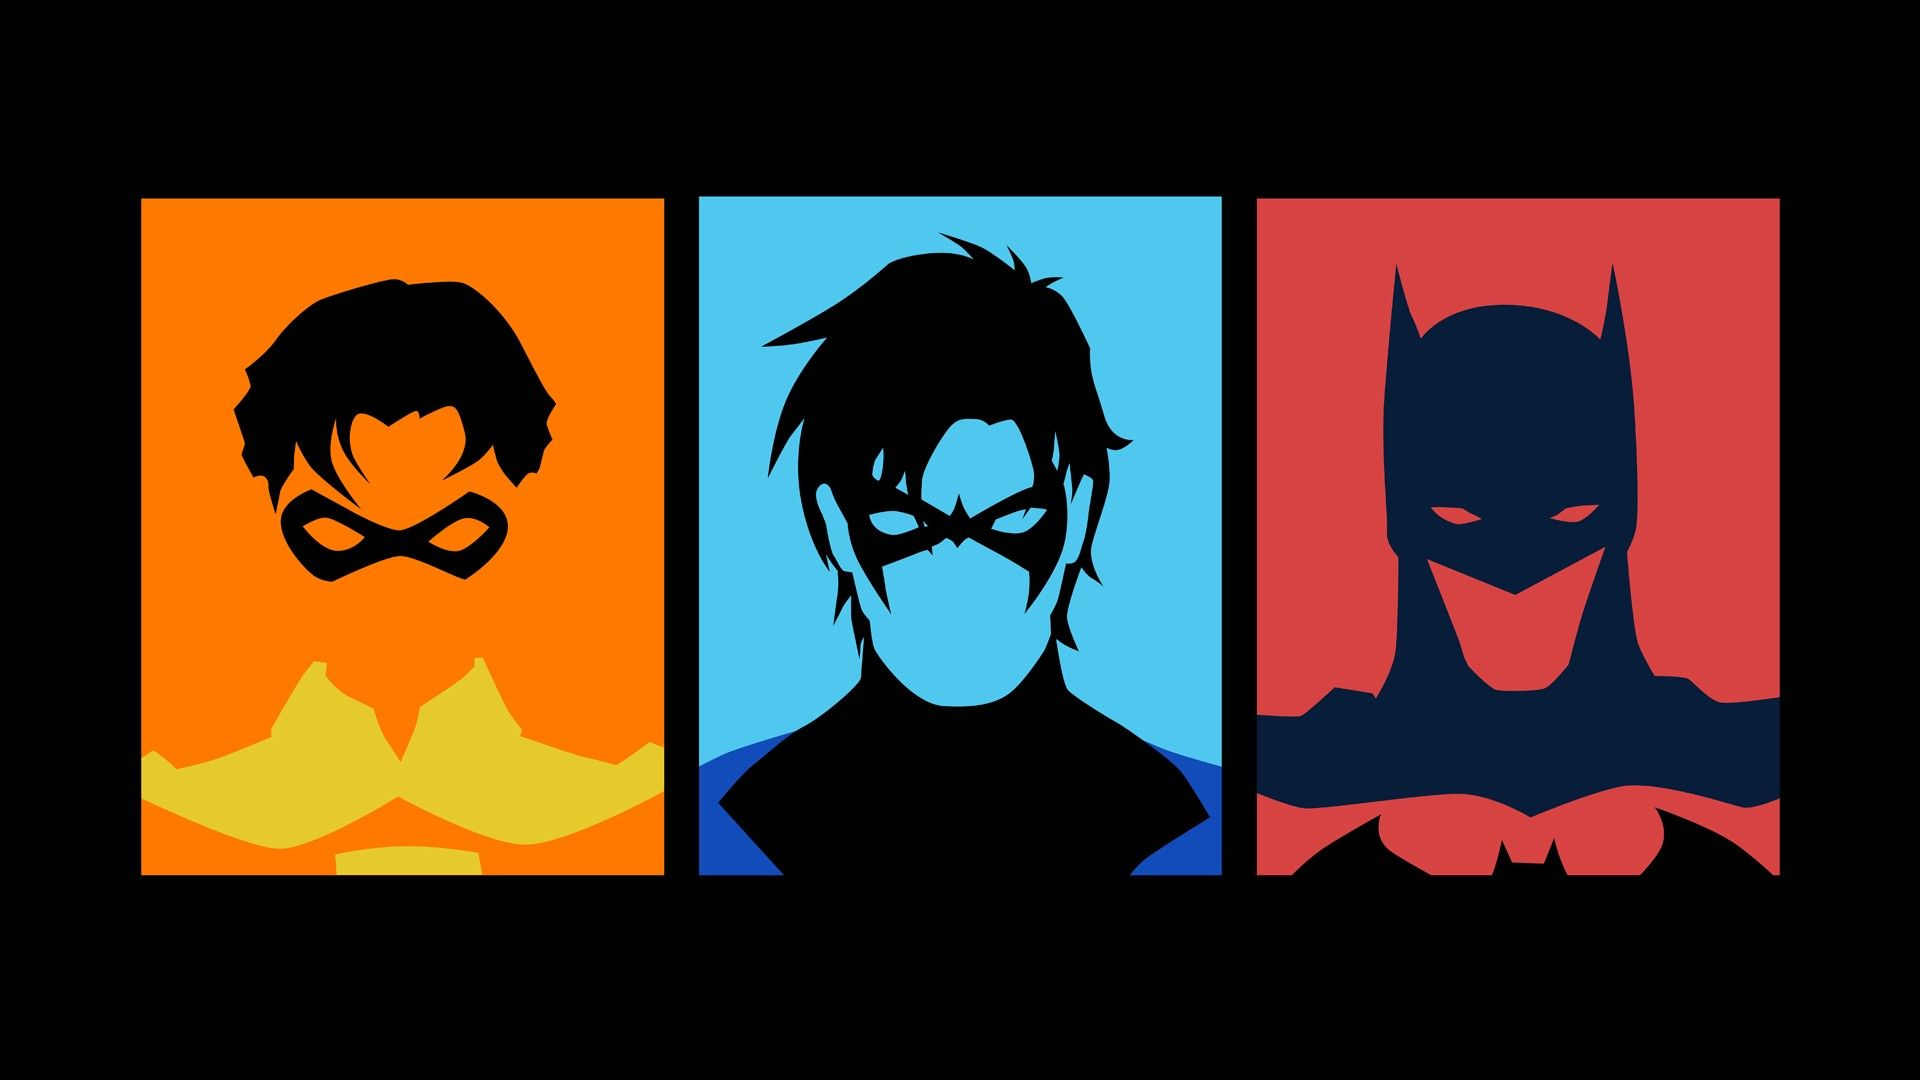 Wallpaper Illustration Graphic Design Roar Movie: Batman HD Wallpapers: Download Batman And Robin Wallpaper